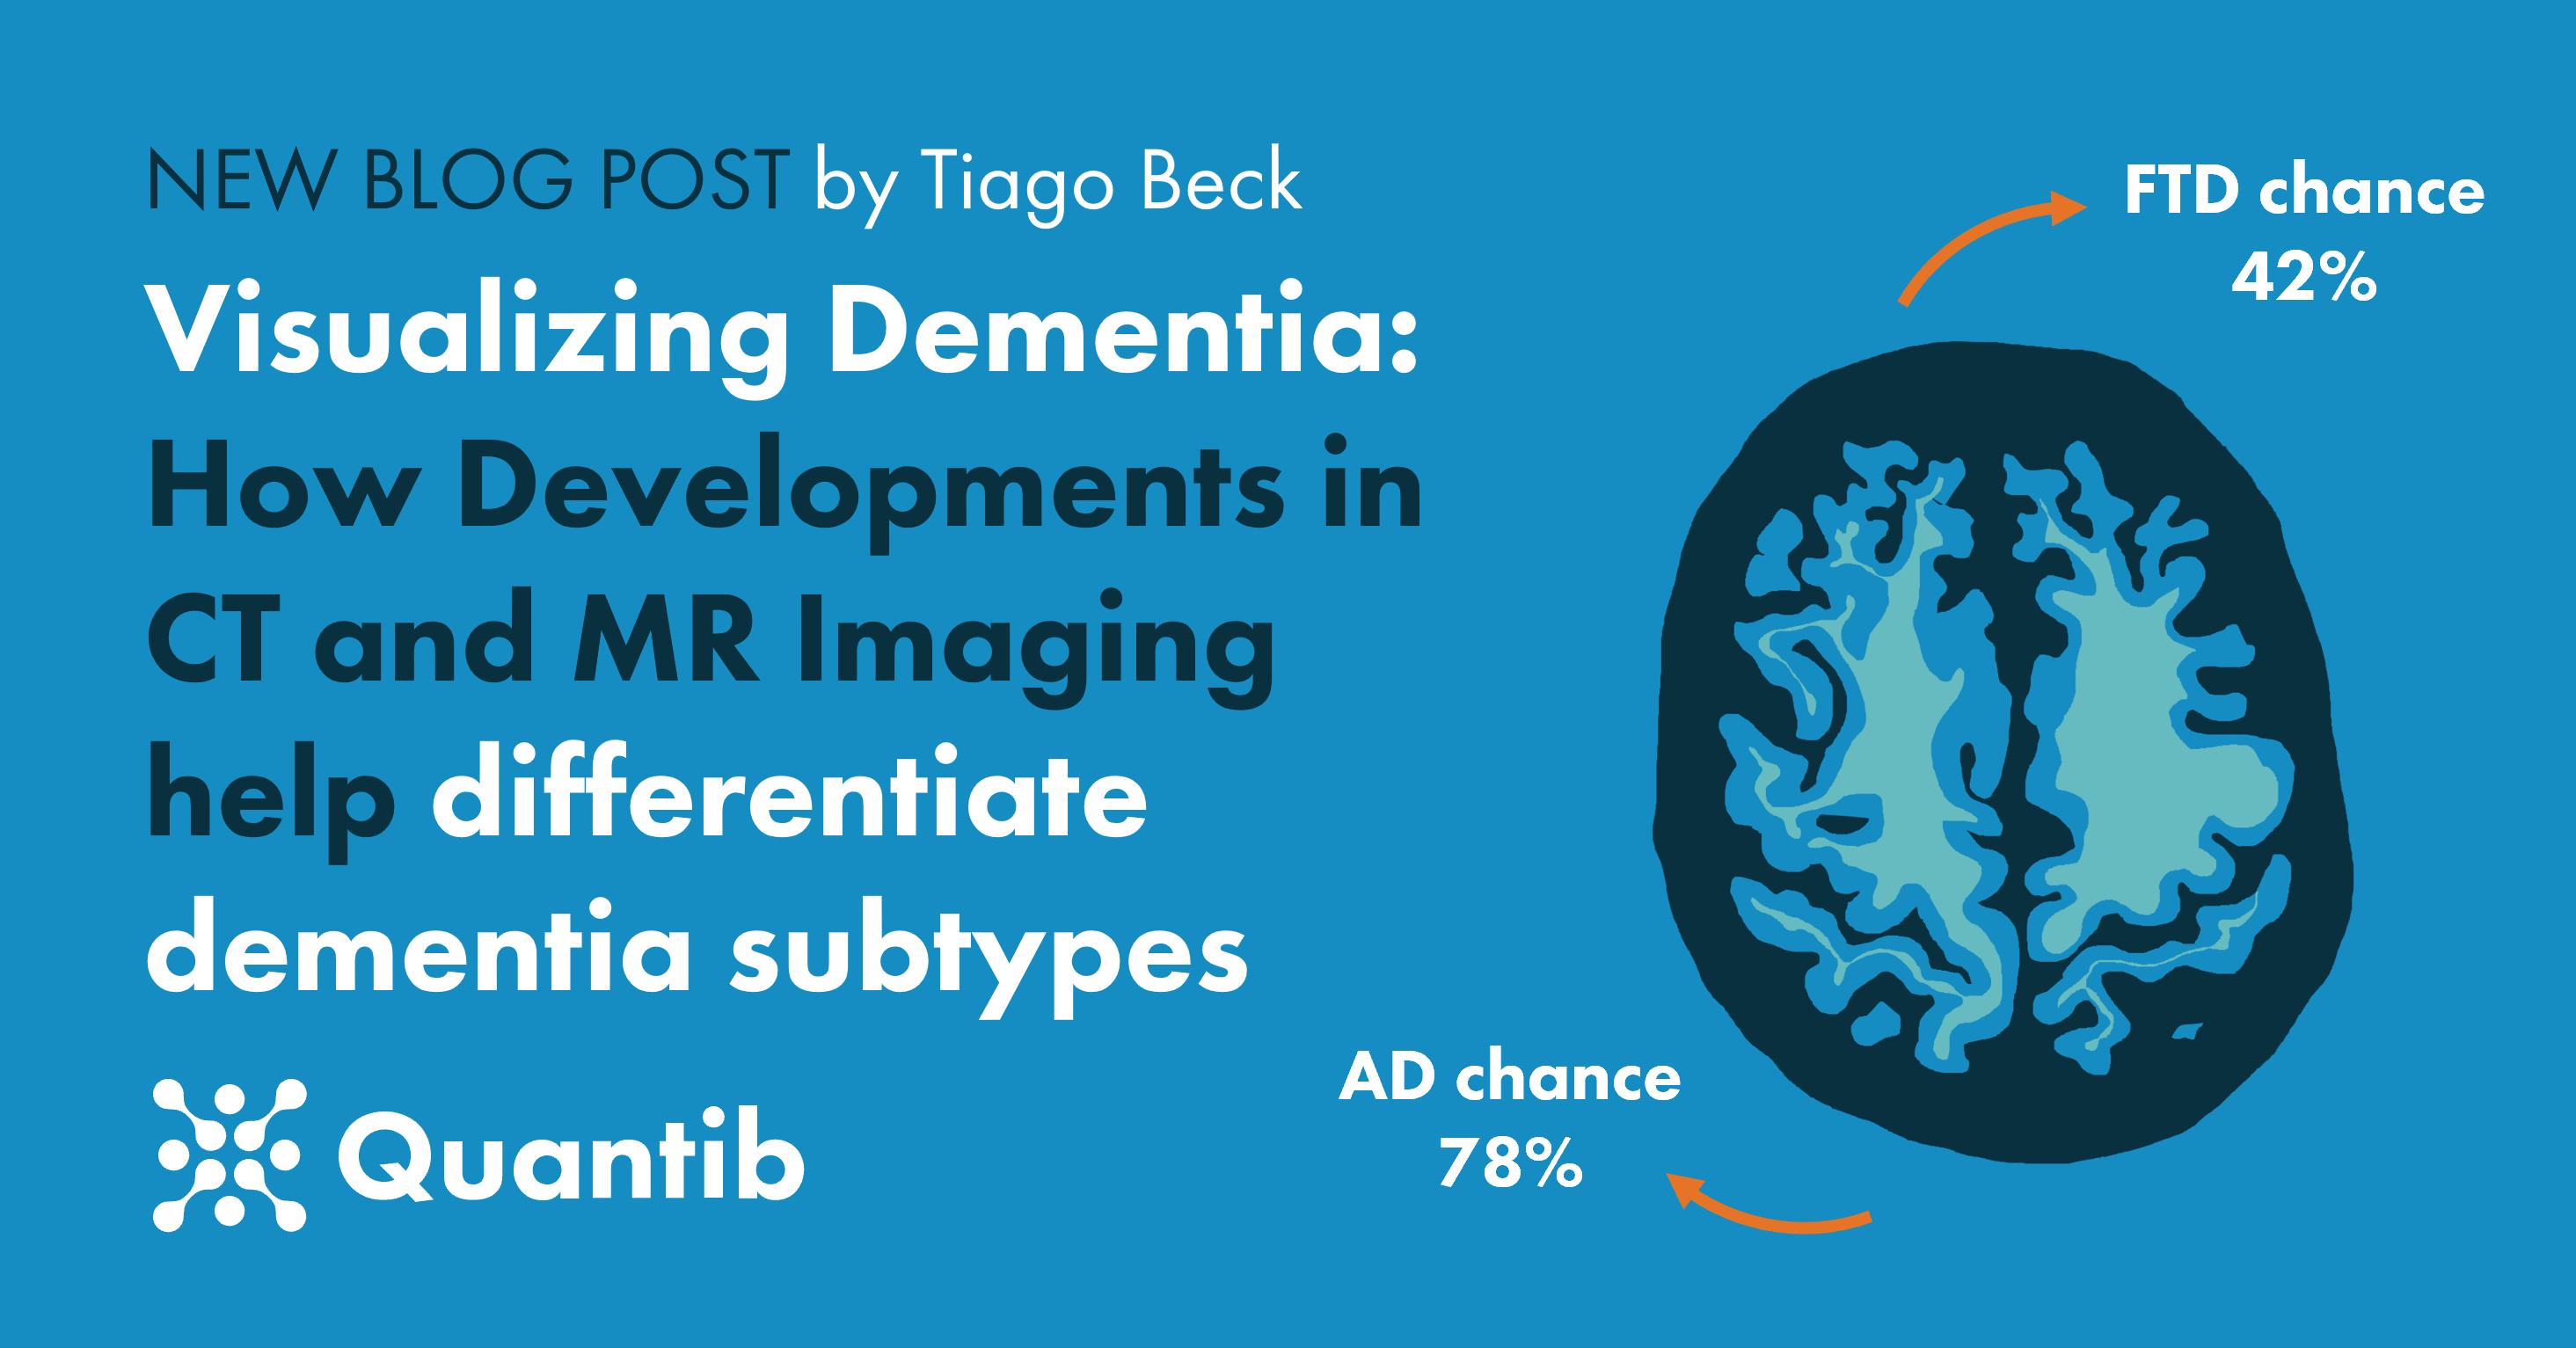 210716 - blog CT and MR for neuroimaging - social media post